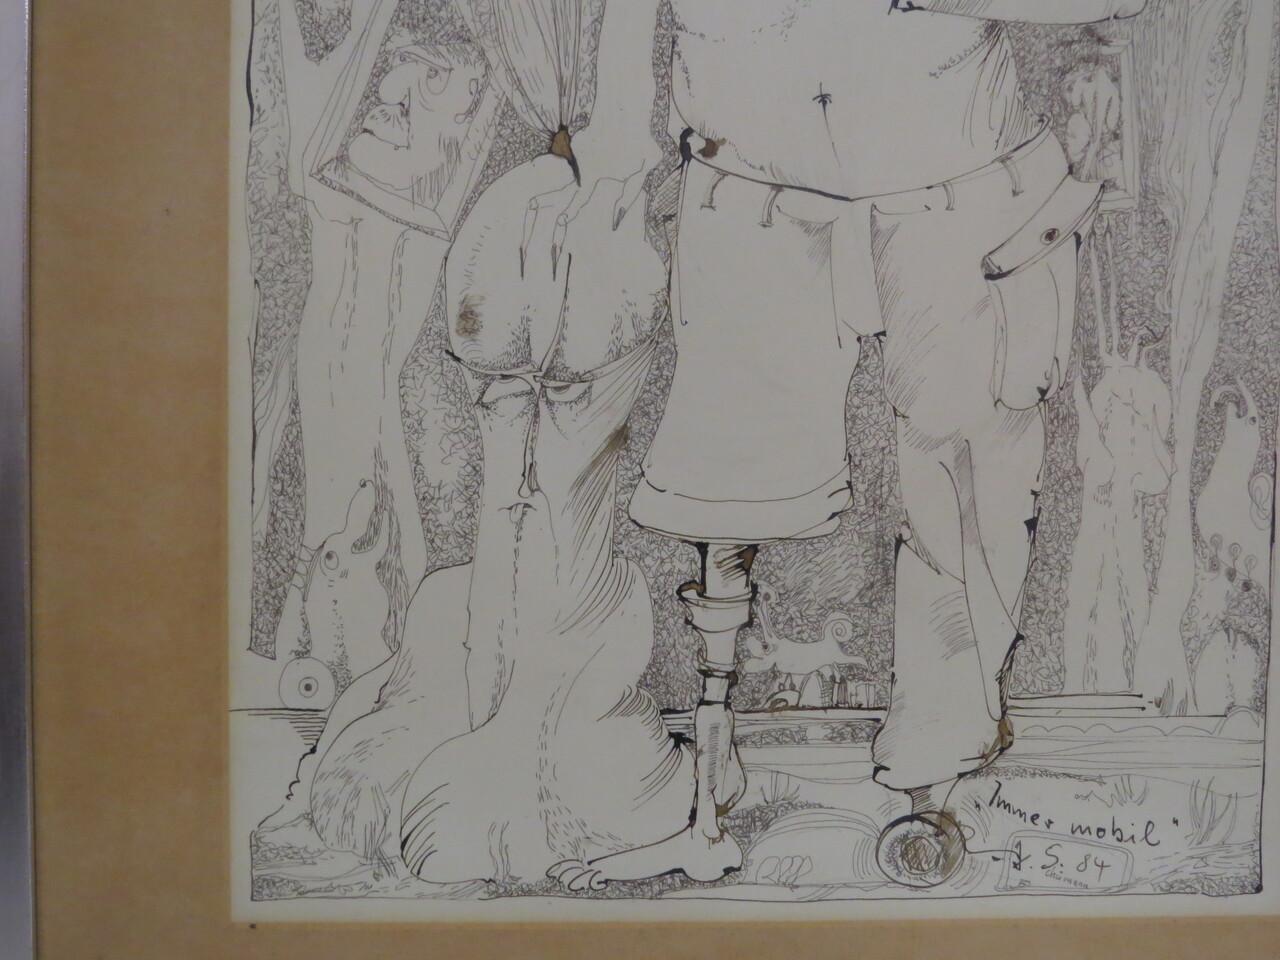 Lote: 12 - Lote: 12 - Dibujo a tinta china